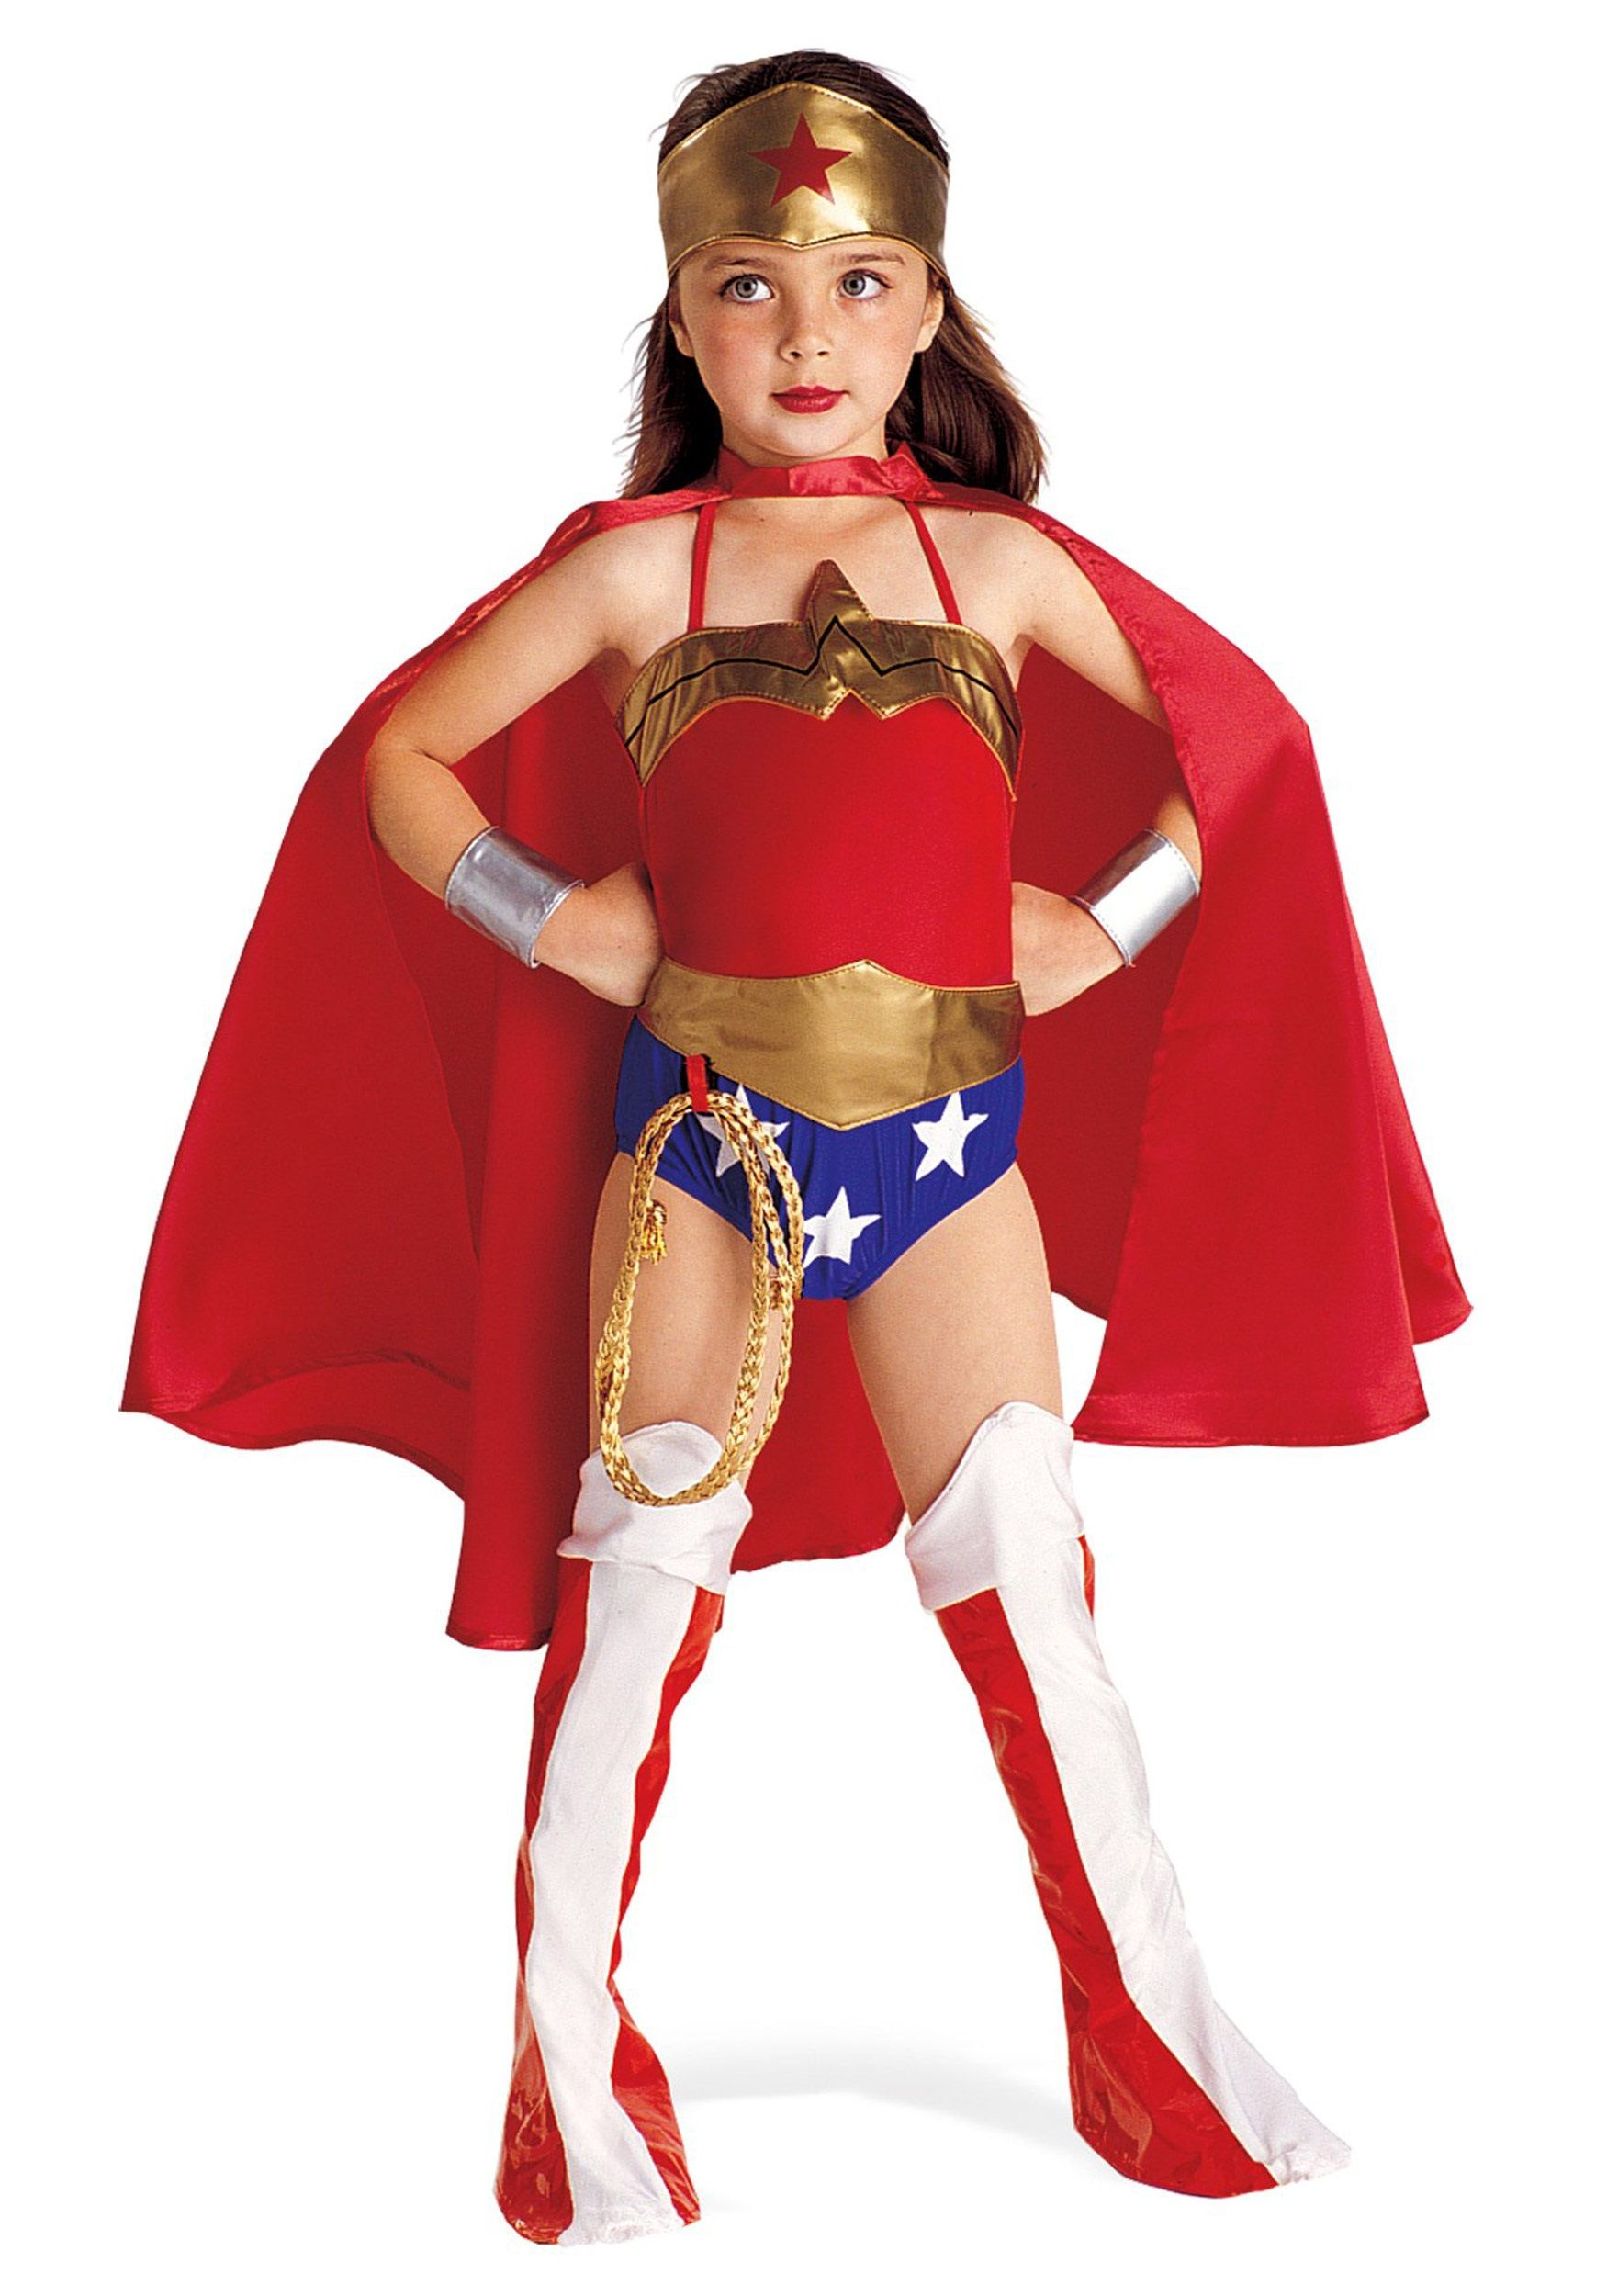 Girls Classic Wonder Woman Costume - Kids Superhero Halloween Costumes  sc 1 st  Pinterest & Girls Classic Wonder Woman Costume - Kids Superhero Halloween ...